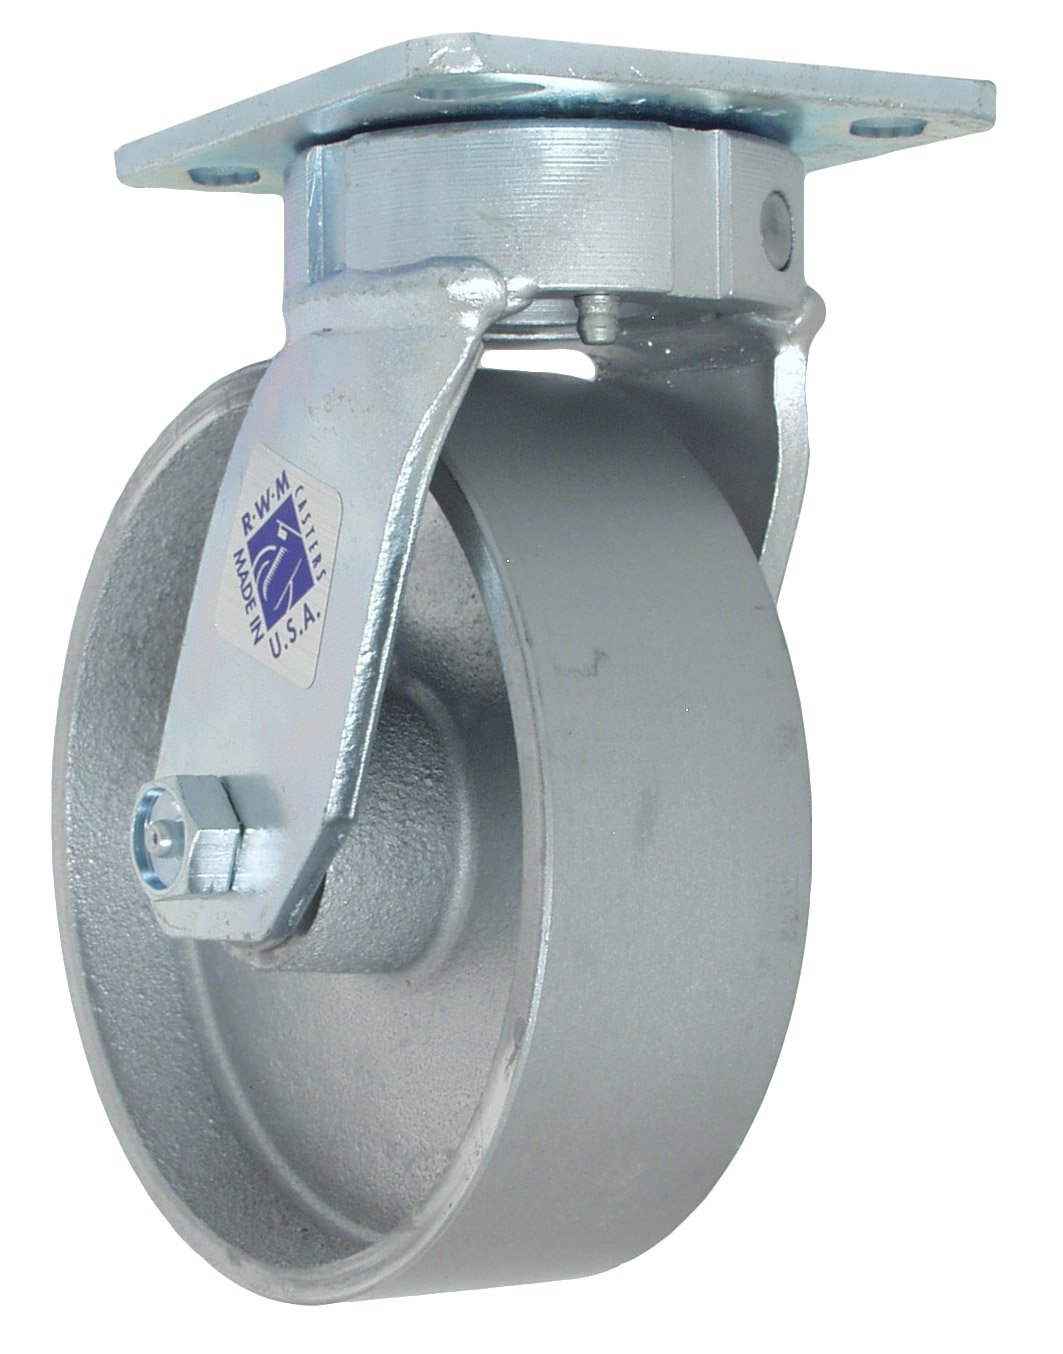 RWM Casters 65 Series Plate Caster, Swivel, Kingpinless, Cast Iron Wheel, Roller Bearing, 1200 lbs Capacity, 6'' Wheel Dia, 2'' Wheel Width, 7-1/2'' Mount Height, 4-1/2'' Plate Length, 4'' Plate Width